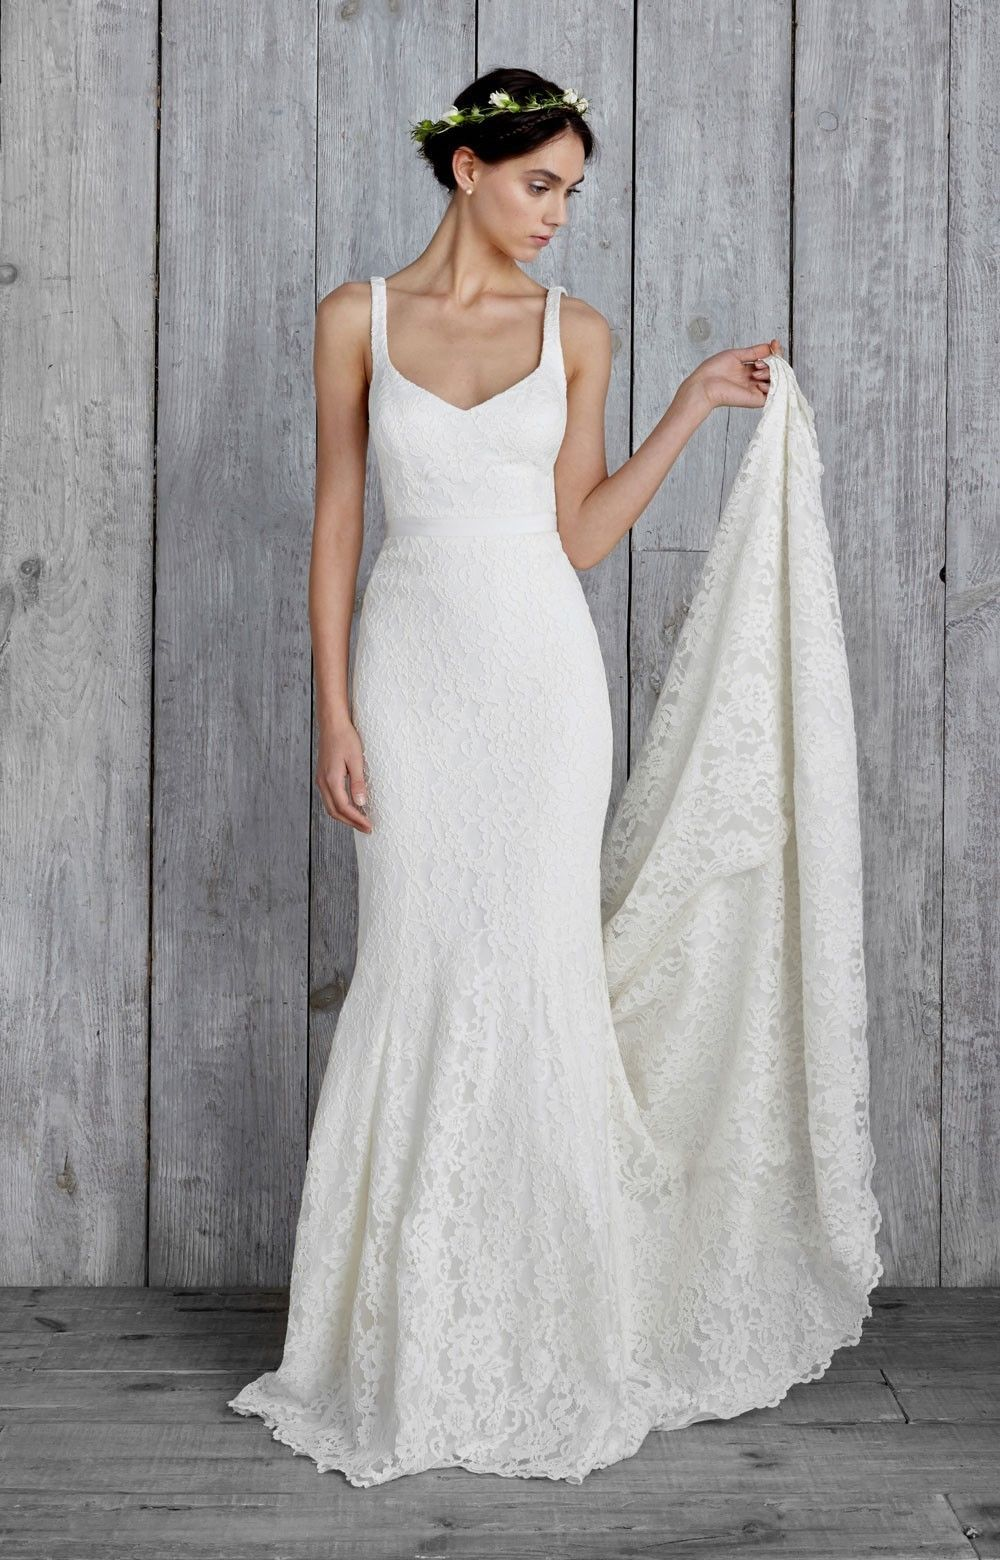 Nicole Miller Janey Lace Wedding Bridal Gown Women s Dress Ivory Size 8 0defc63b64